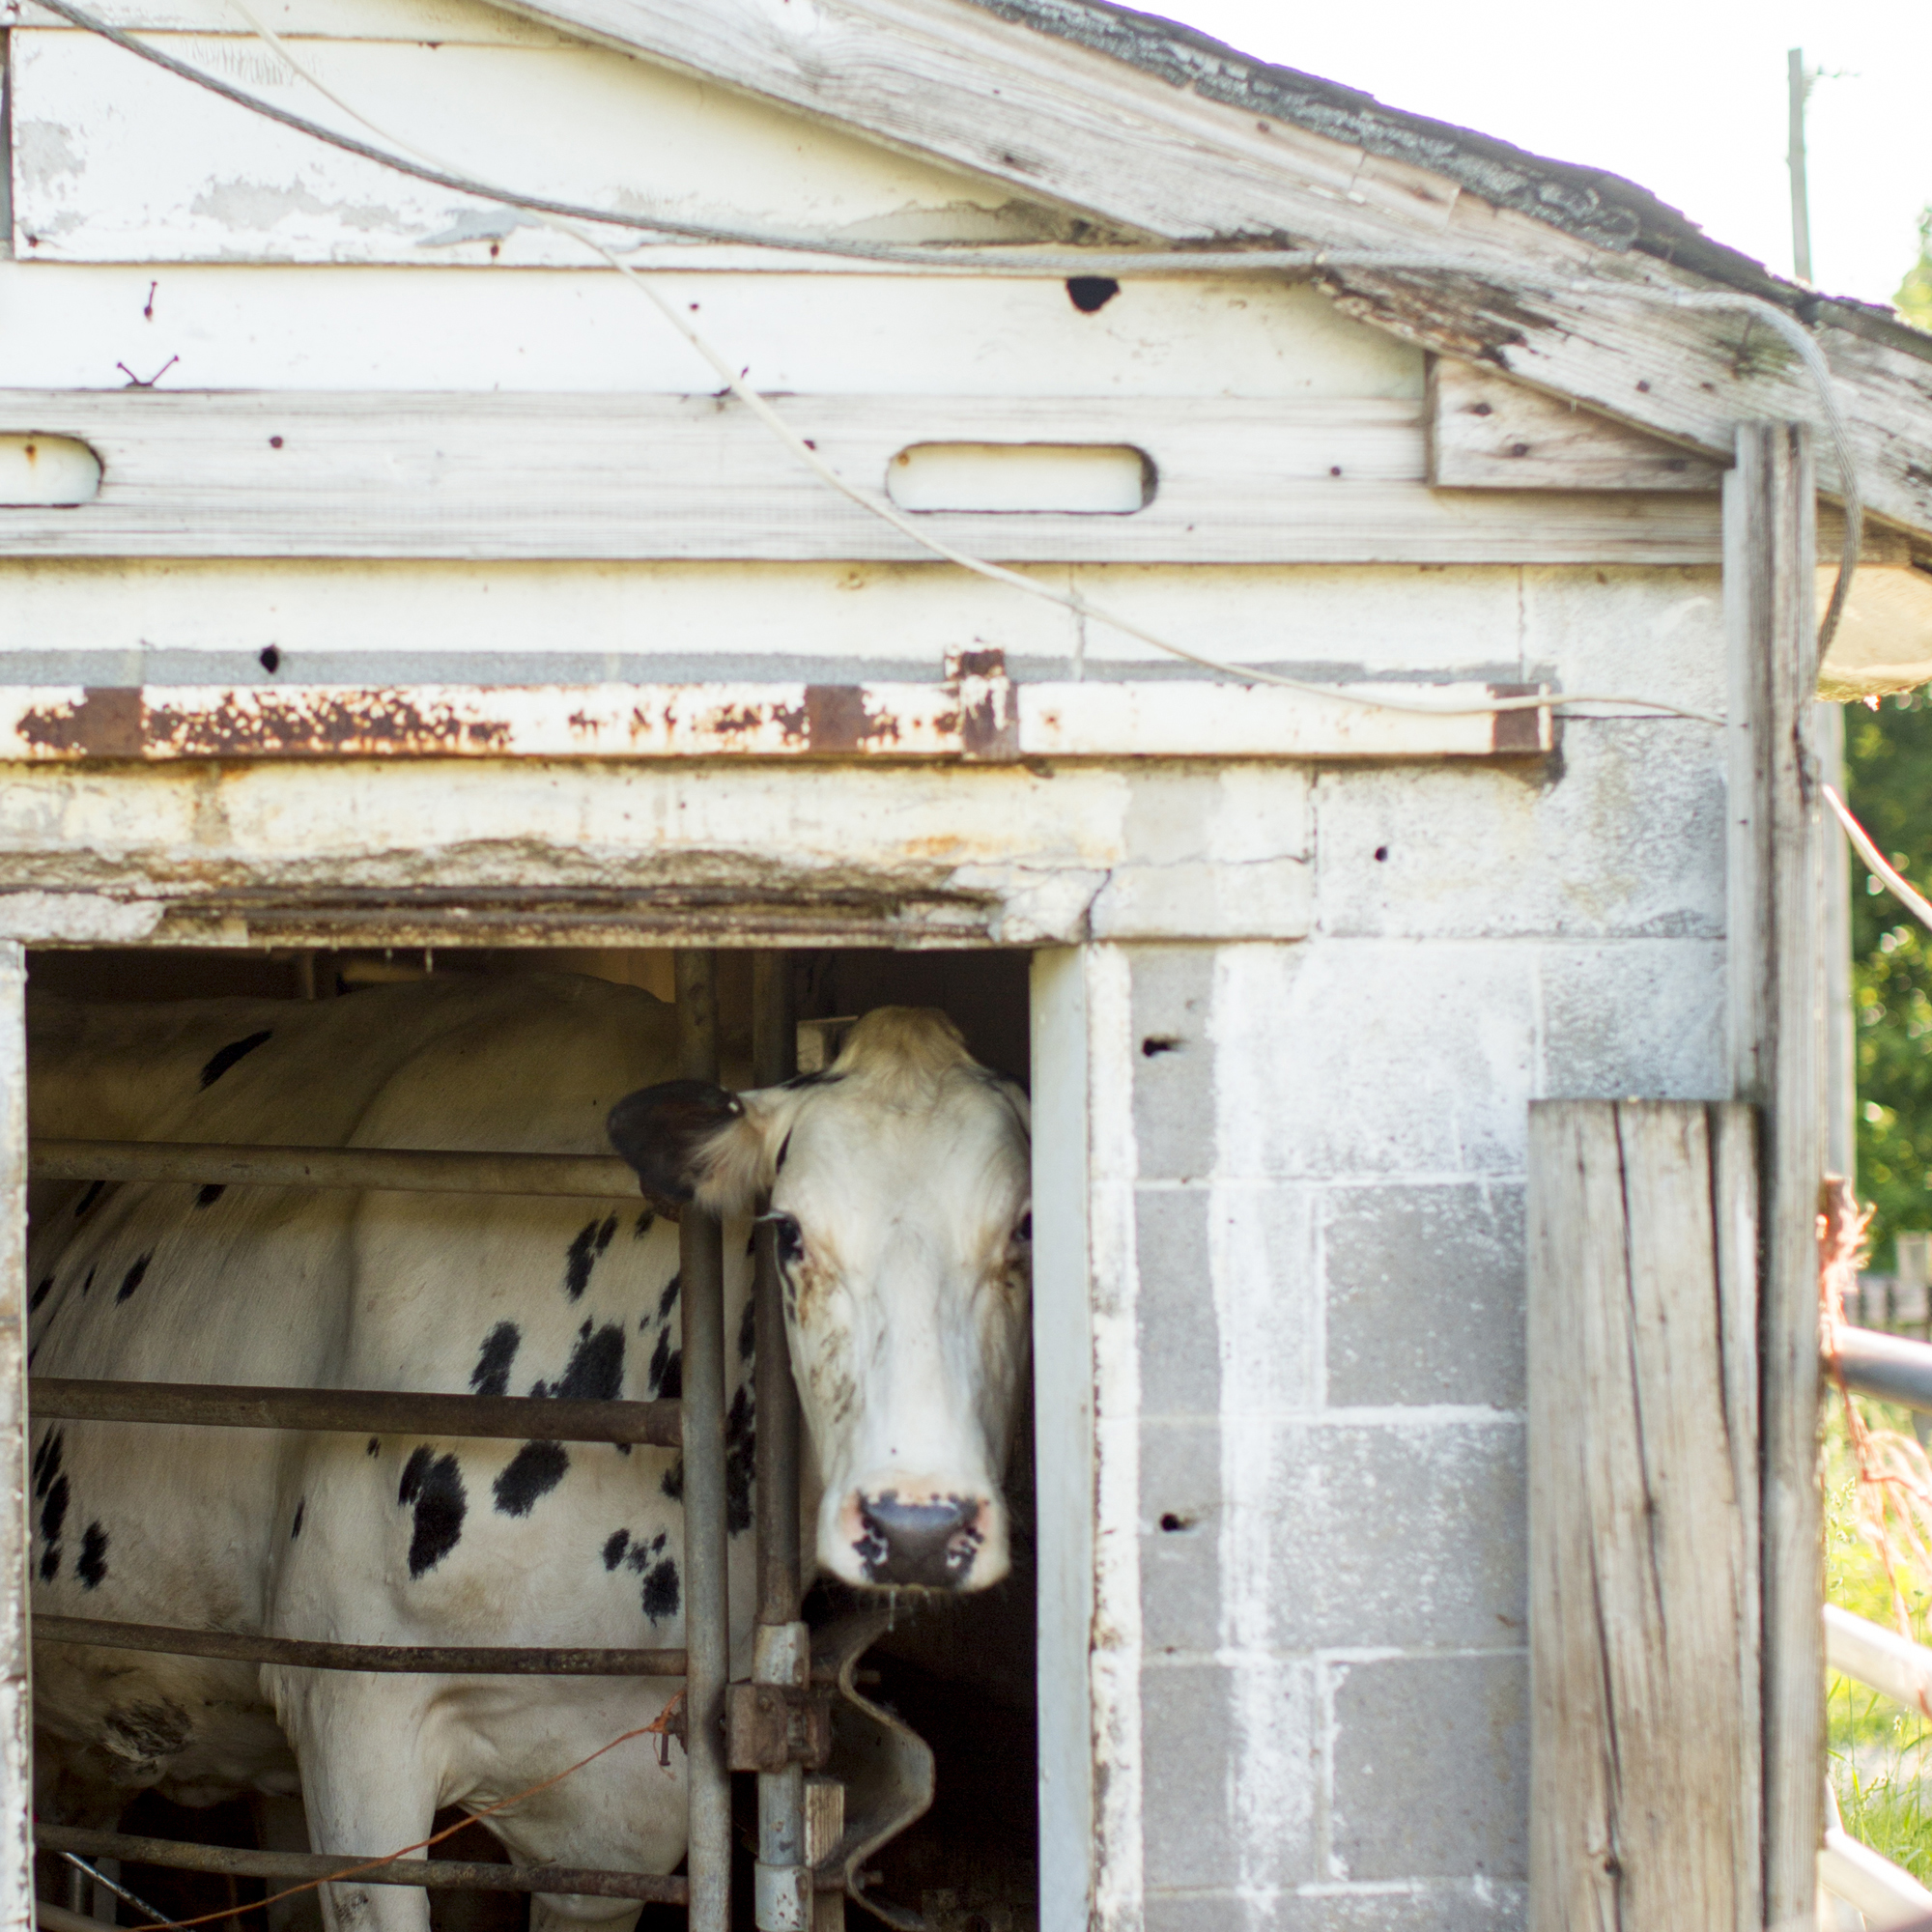 Seriously_Sabrina_Photography_Jericho_Acres_Kentucky_Dairy_May_23_2018_42.jpg